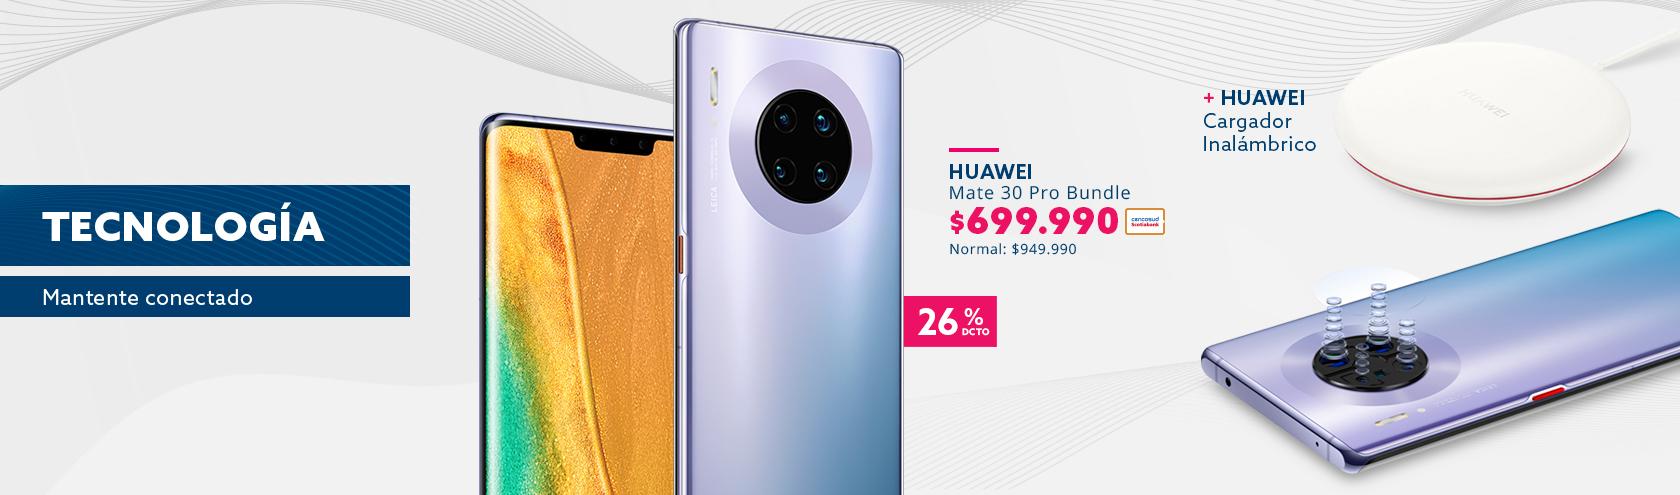 Huawei Mate 30 Pro Bundle